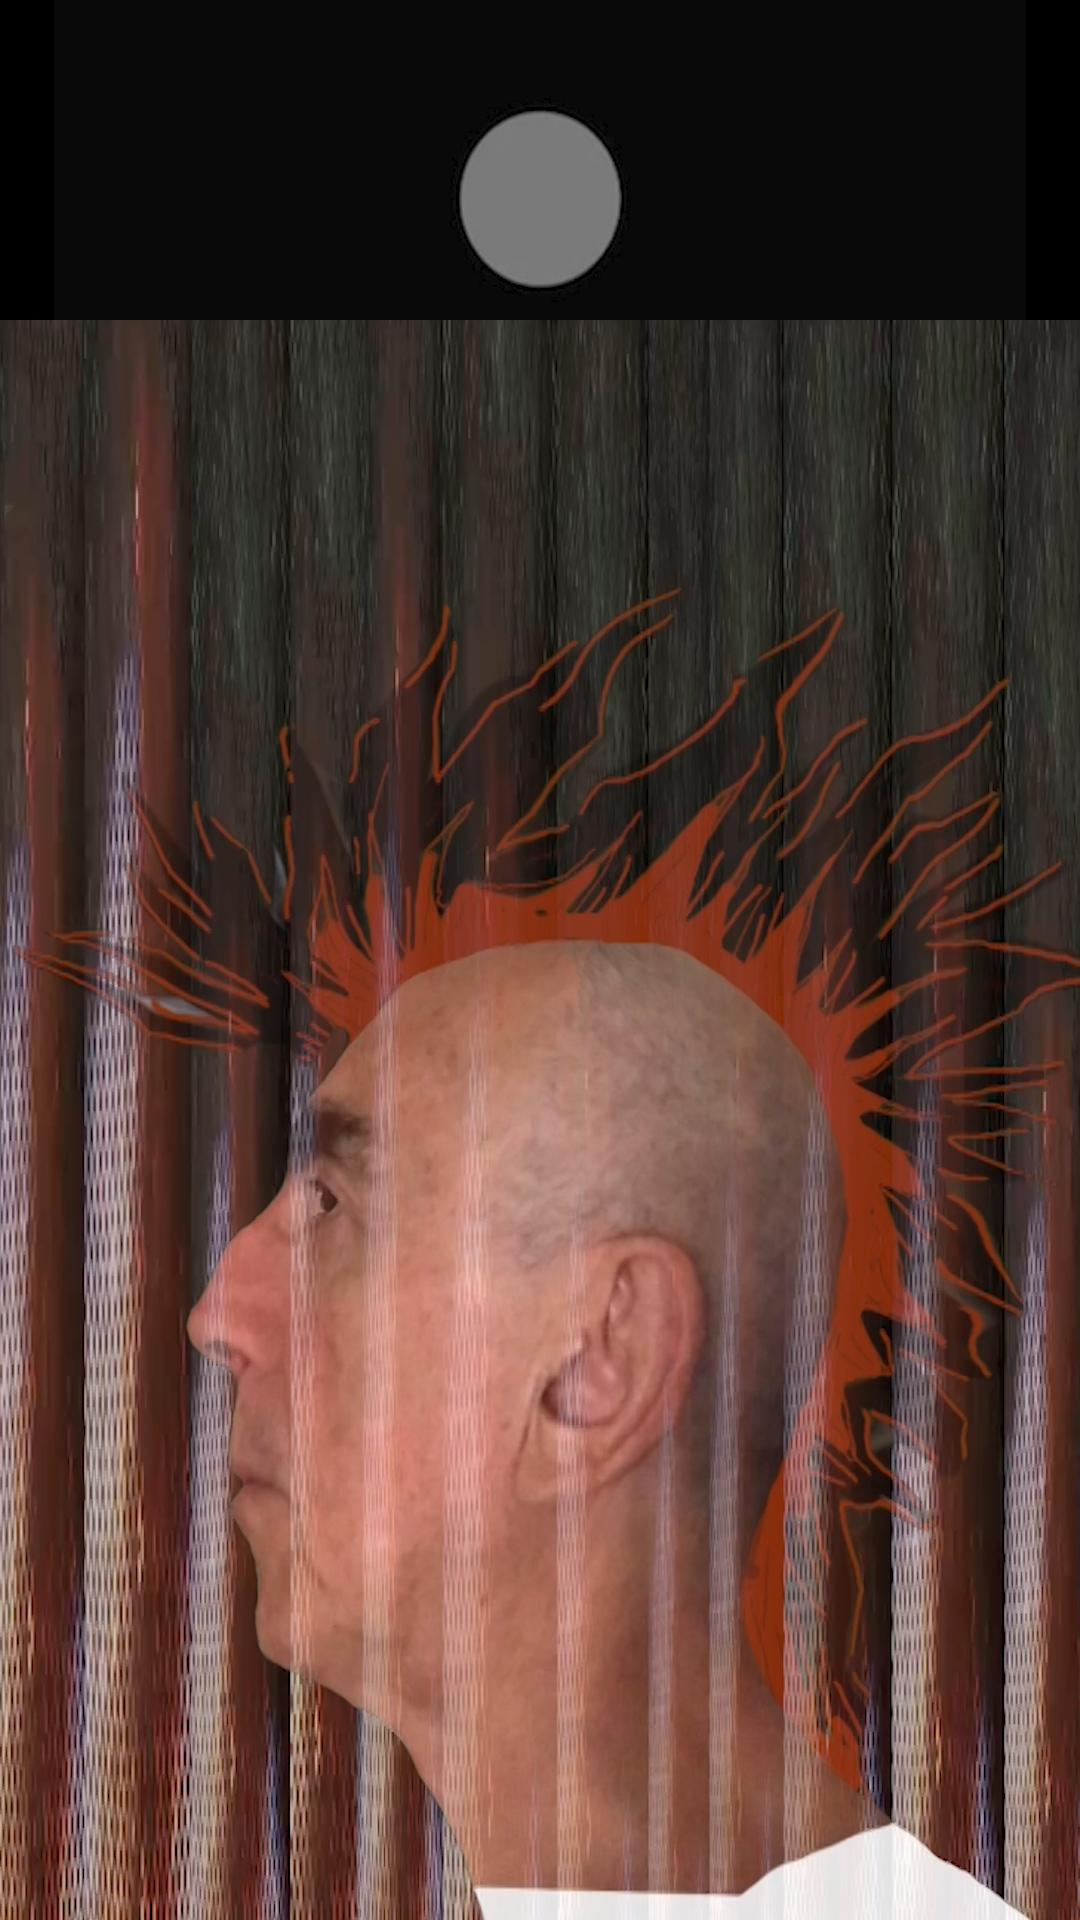 Retrato vulcanpunk de mi amigo Jotta (2021) - Ángel Baltasar